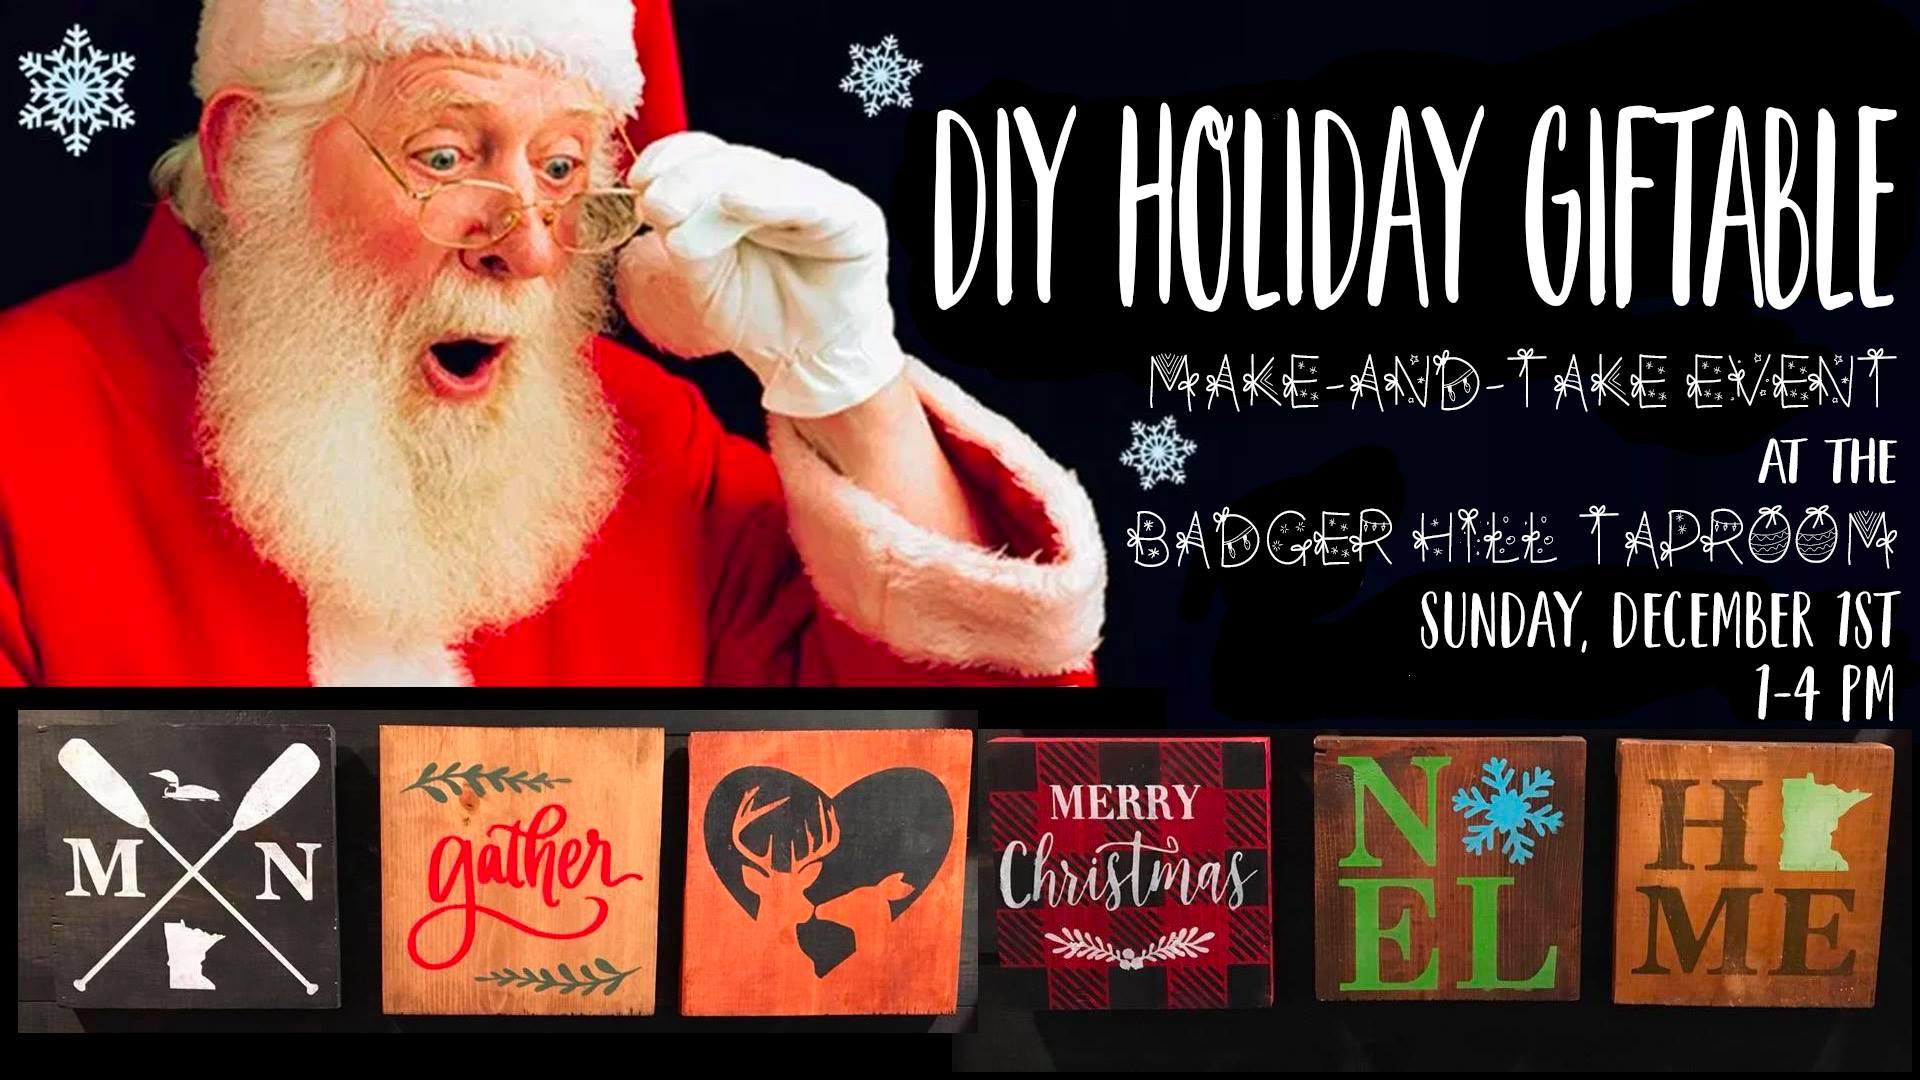 DIY Holiday Signs and Gifts